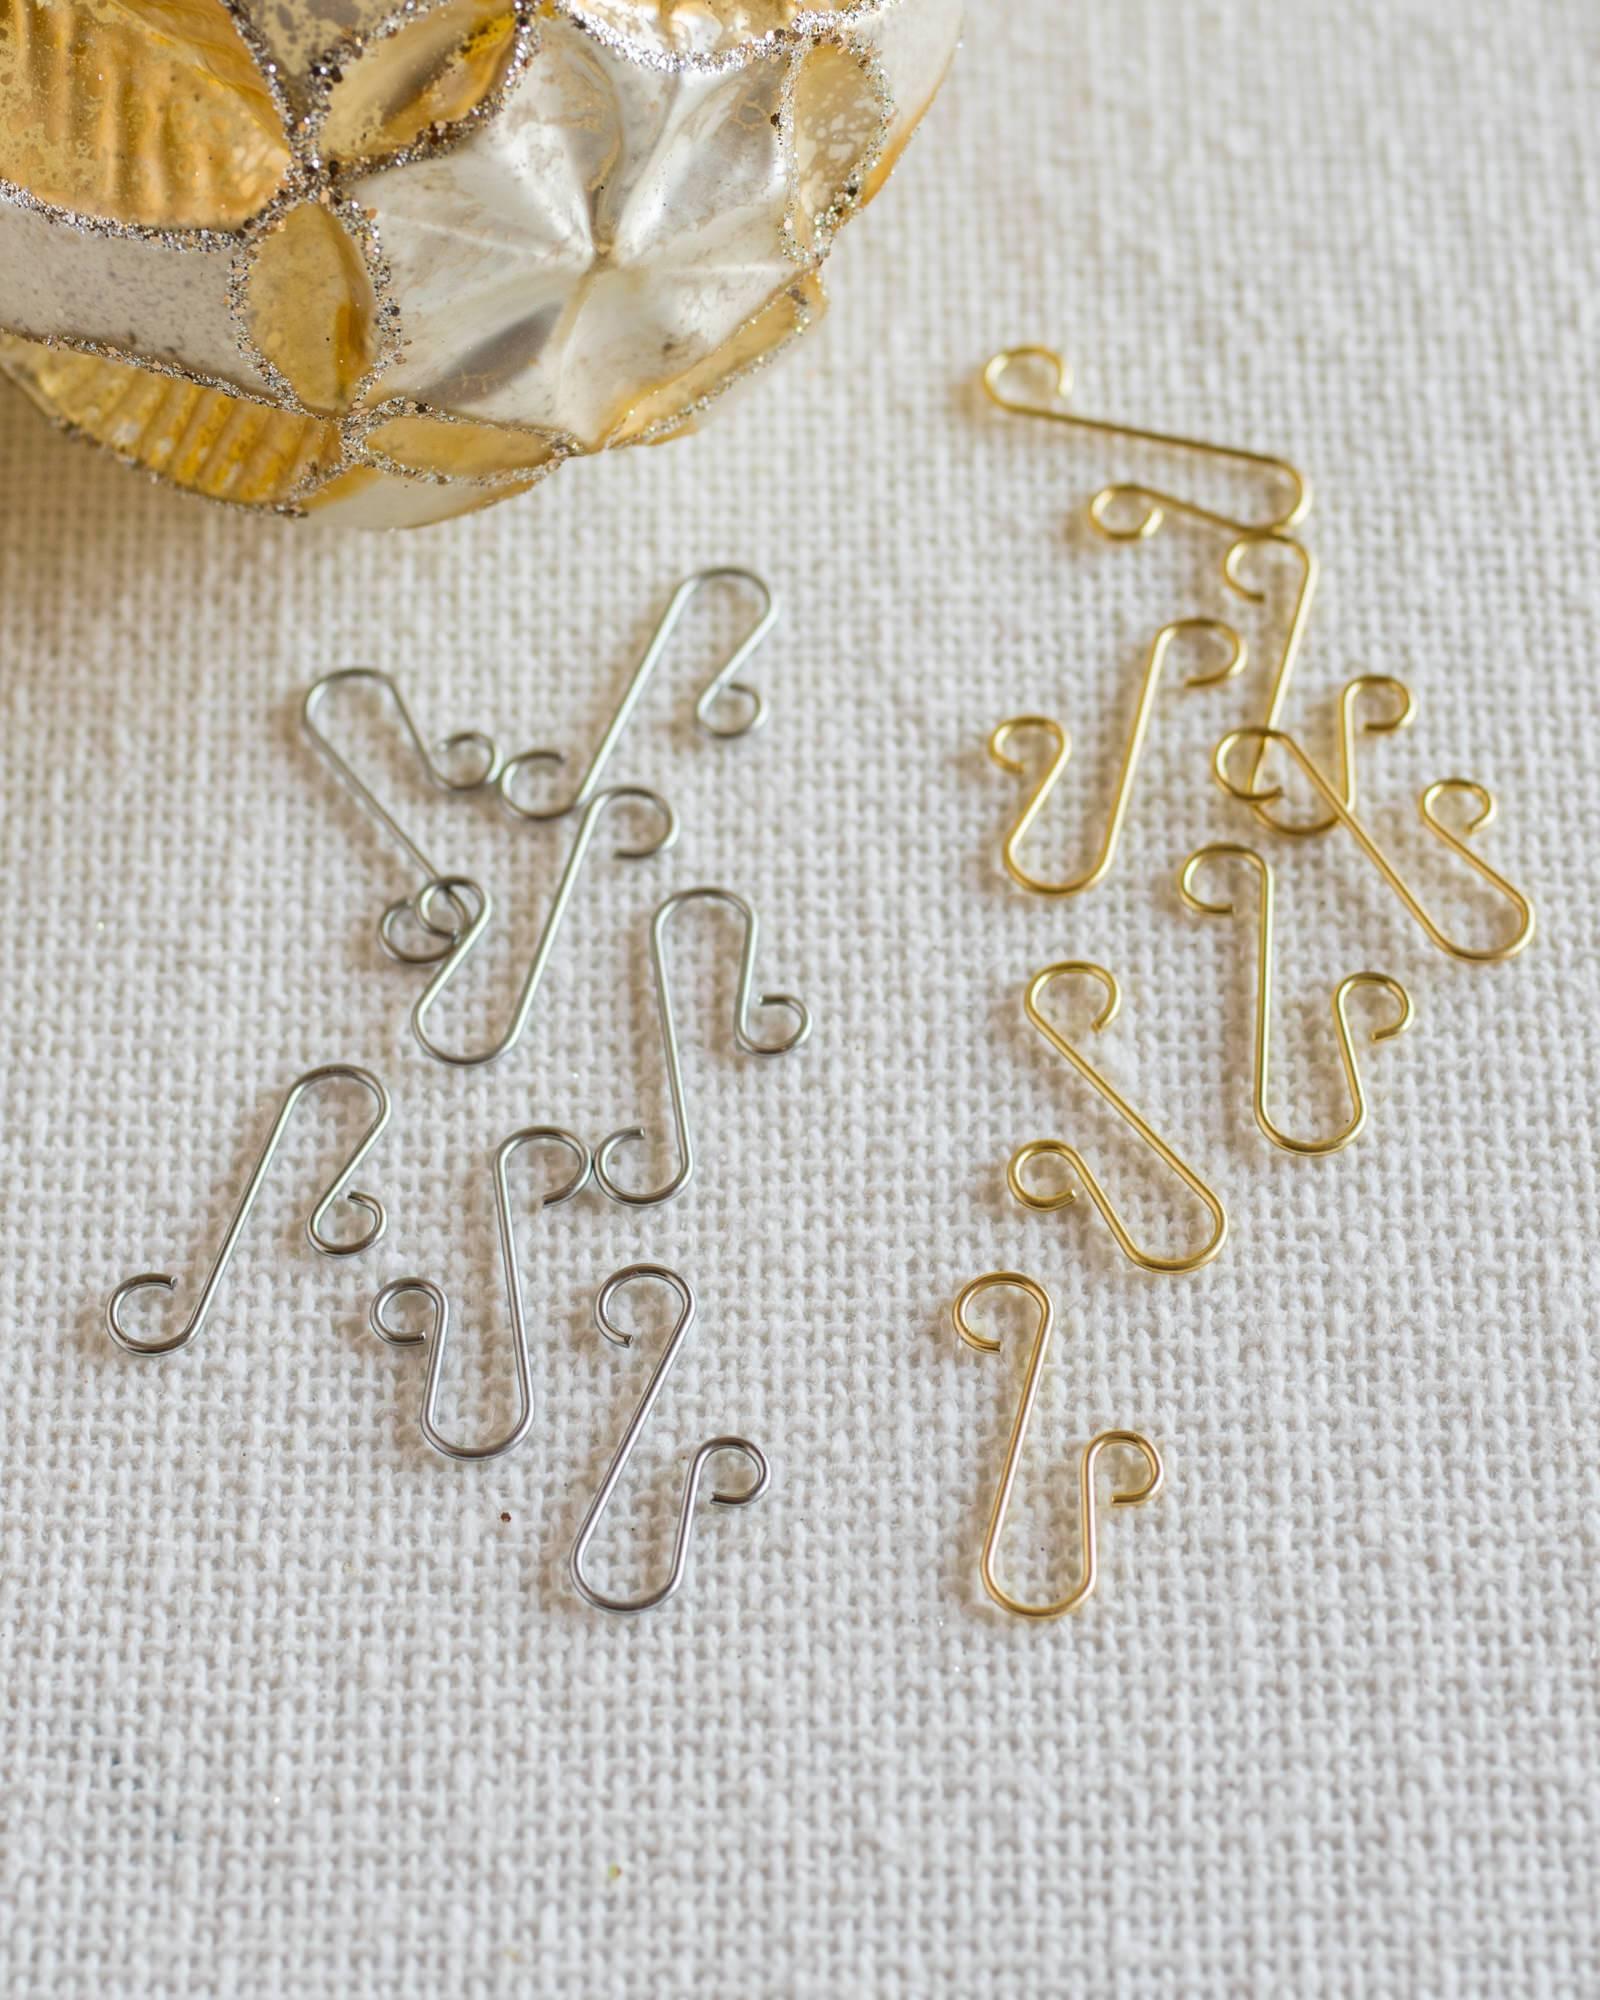 Heavy duty ornament hooks - Gold Ornament Hooks Set Of 100 Main